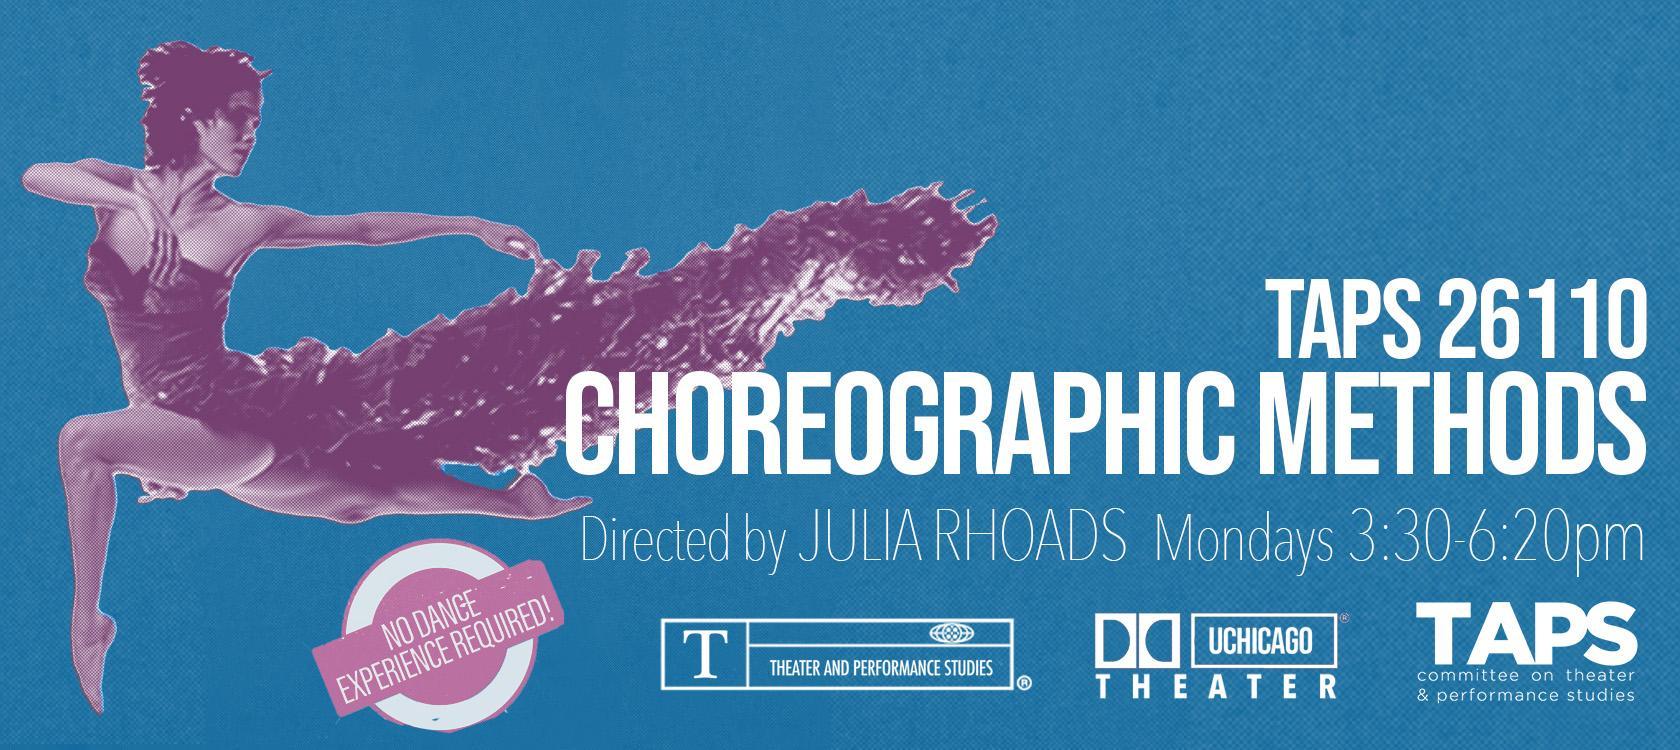 Choreographic Methods